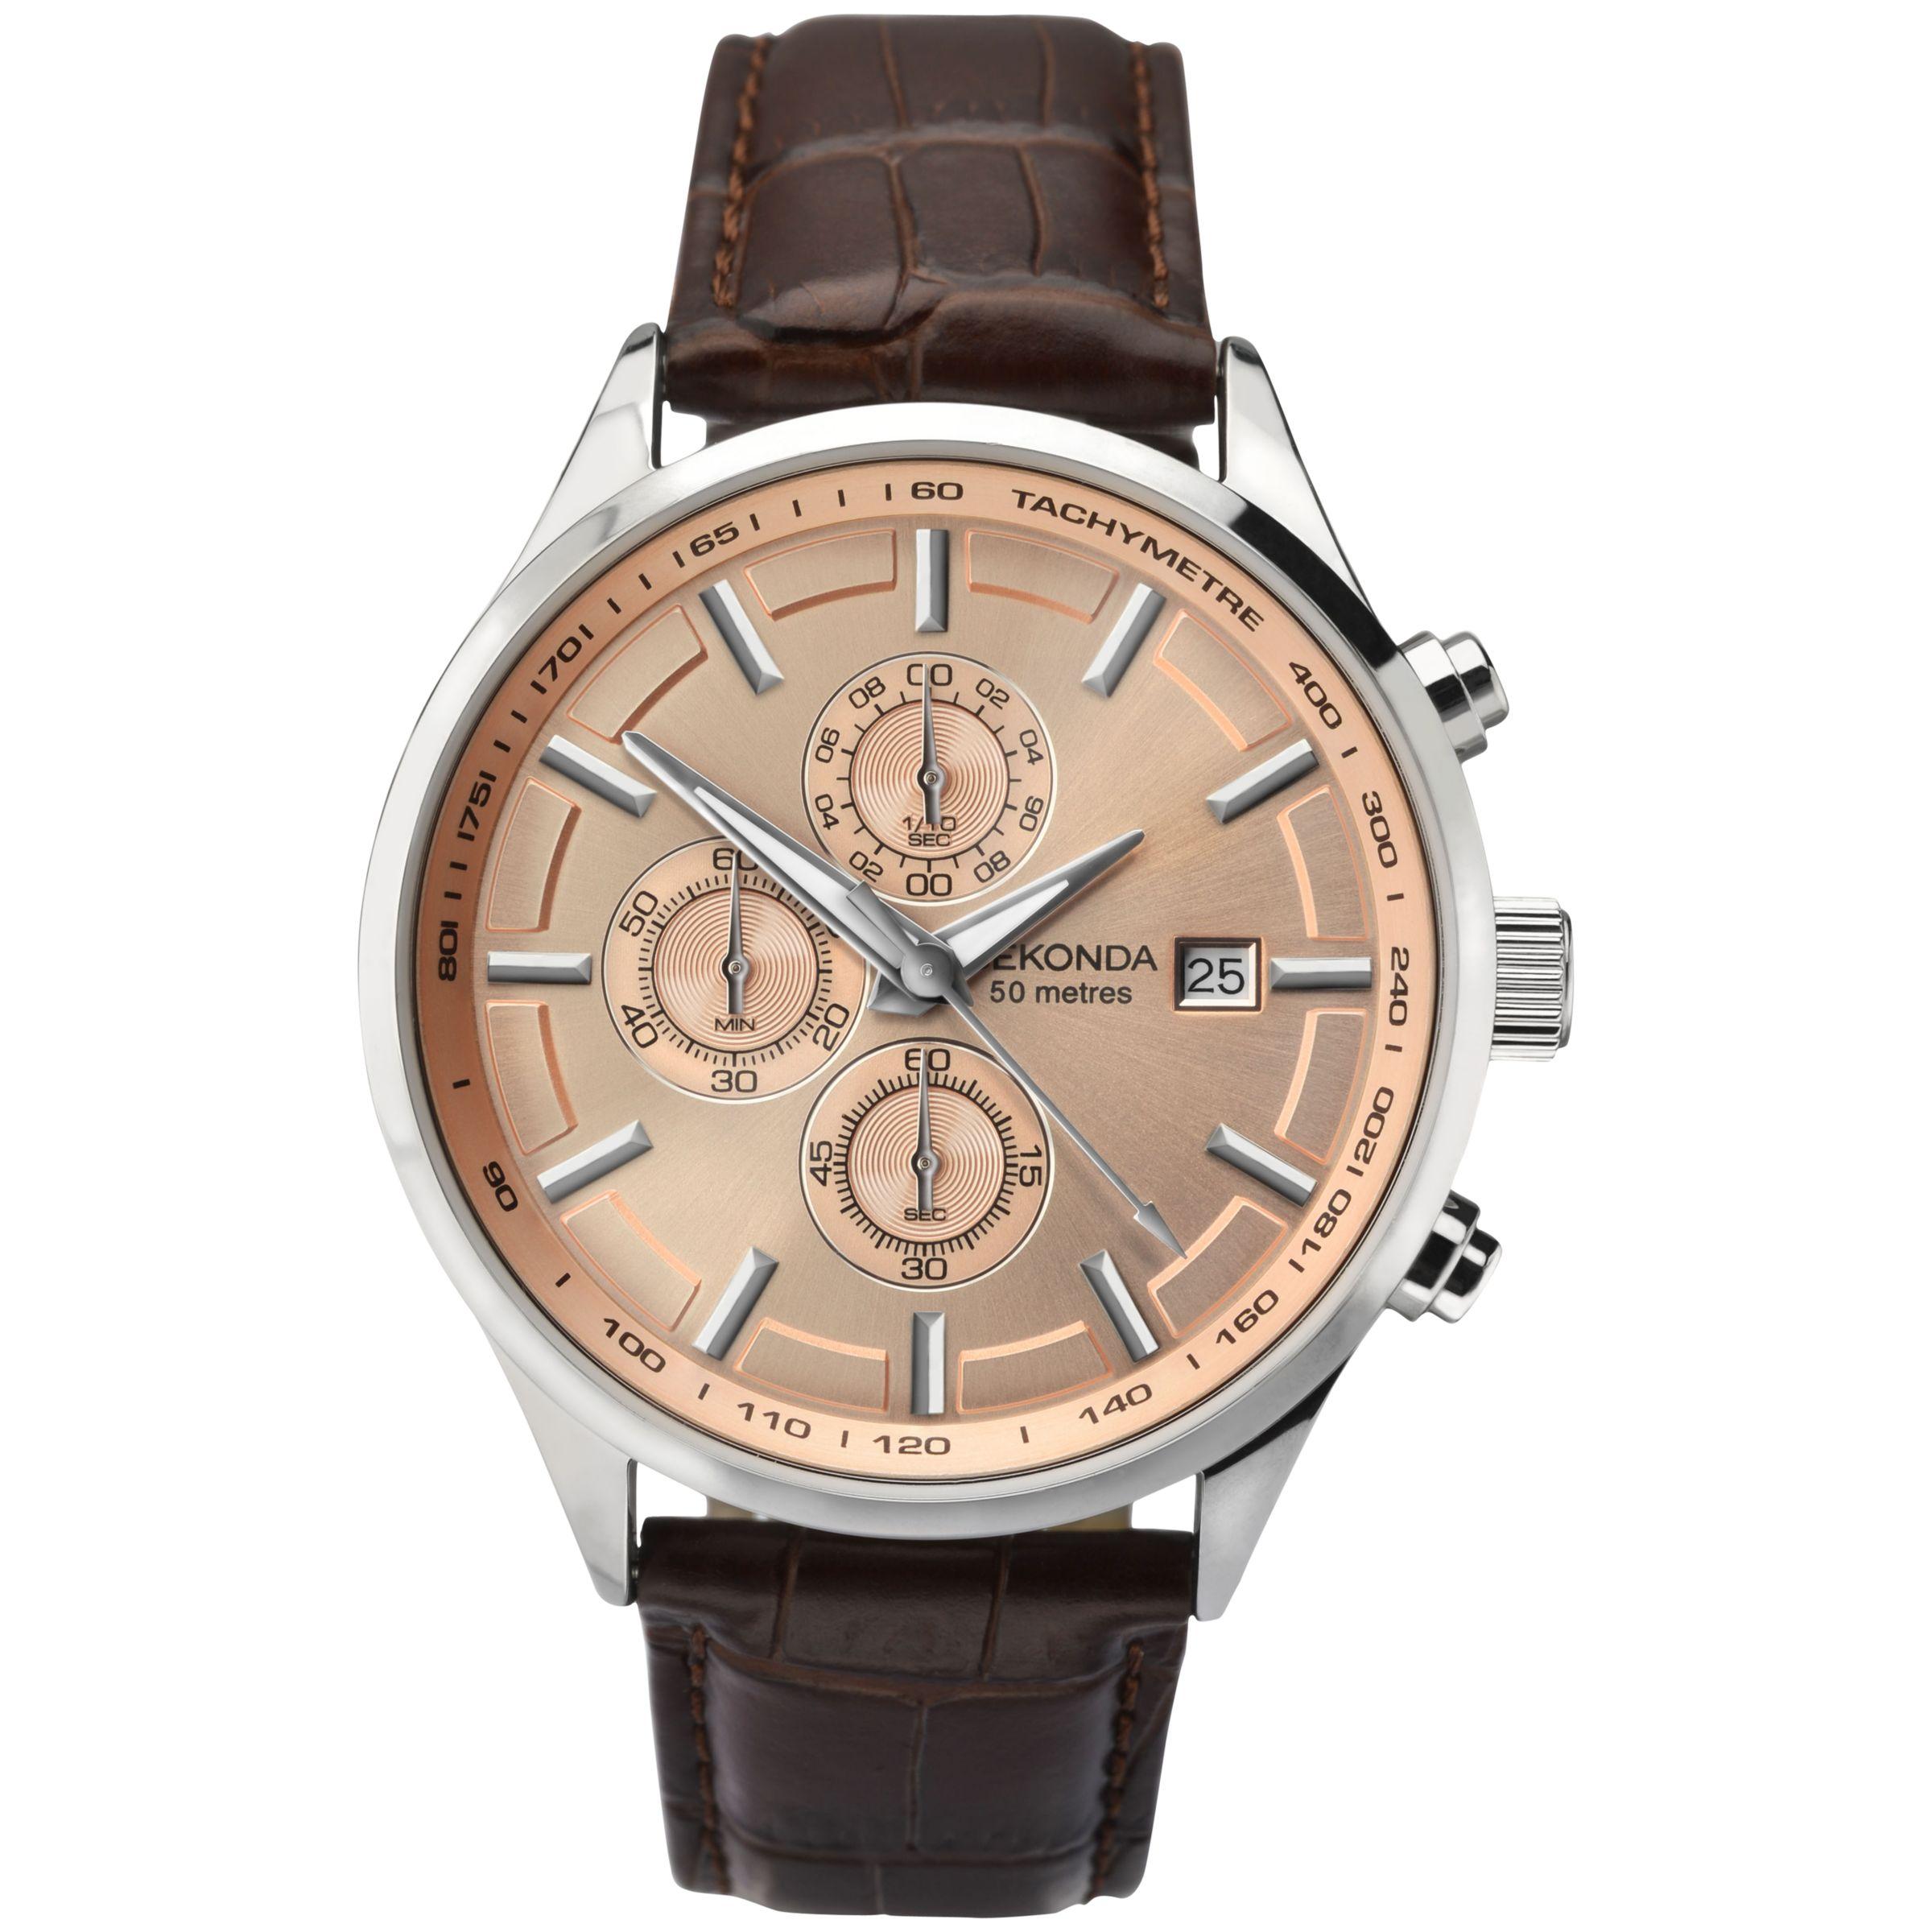 Sekonda Sekonda 1105.27 Men's Chronograph Leather Strap Watch, Brown/Rose Gold